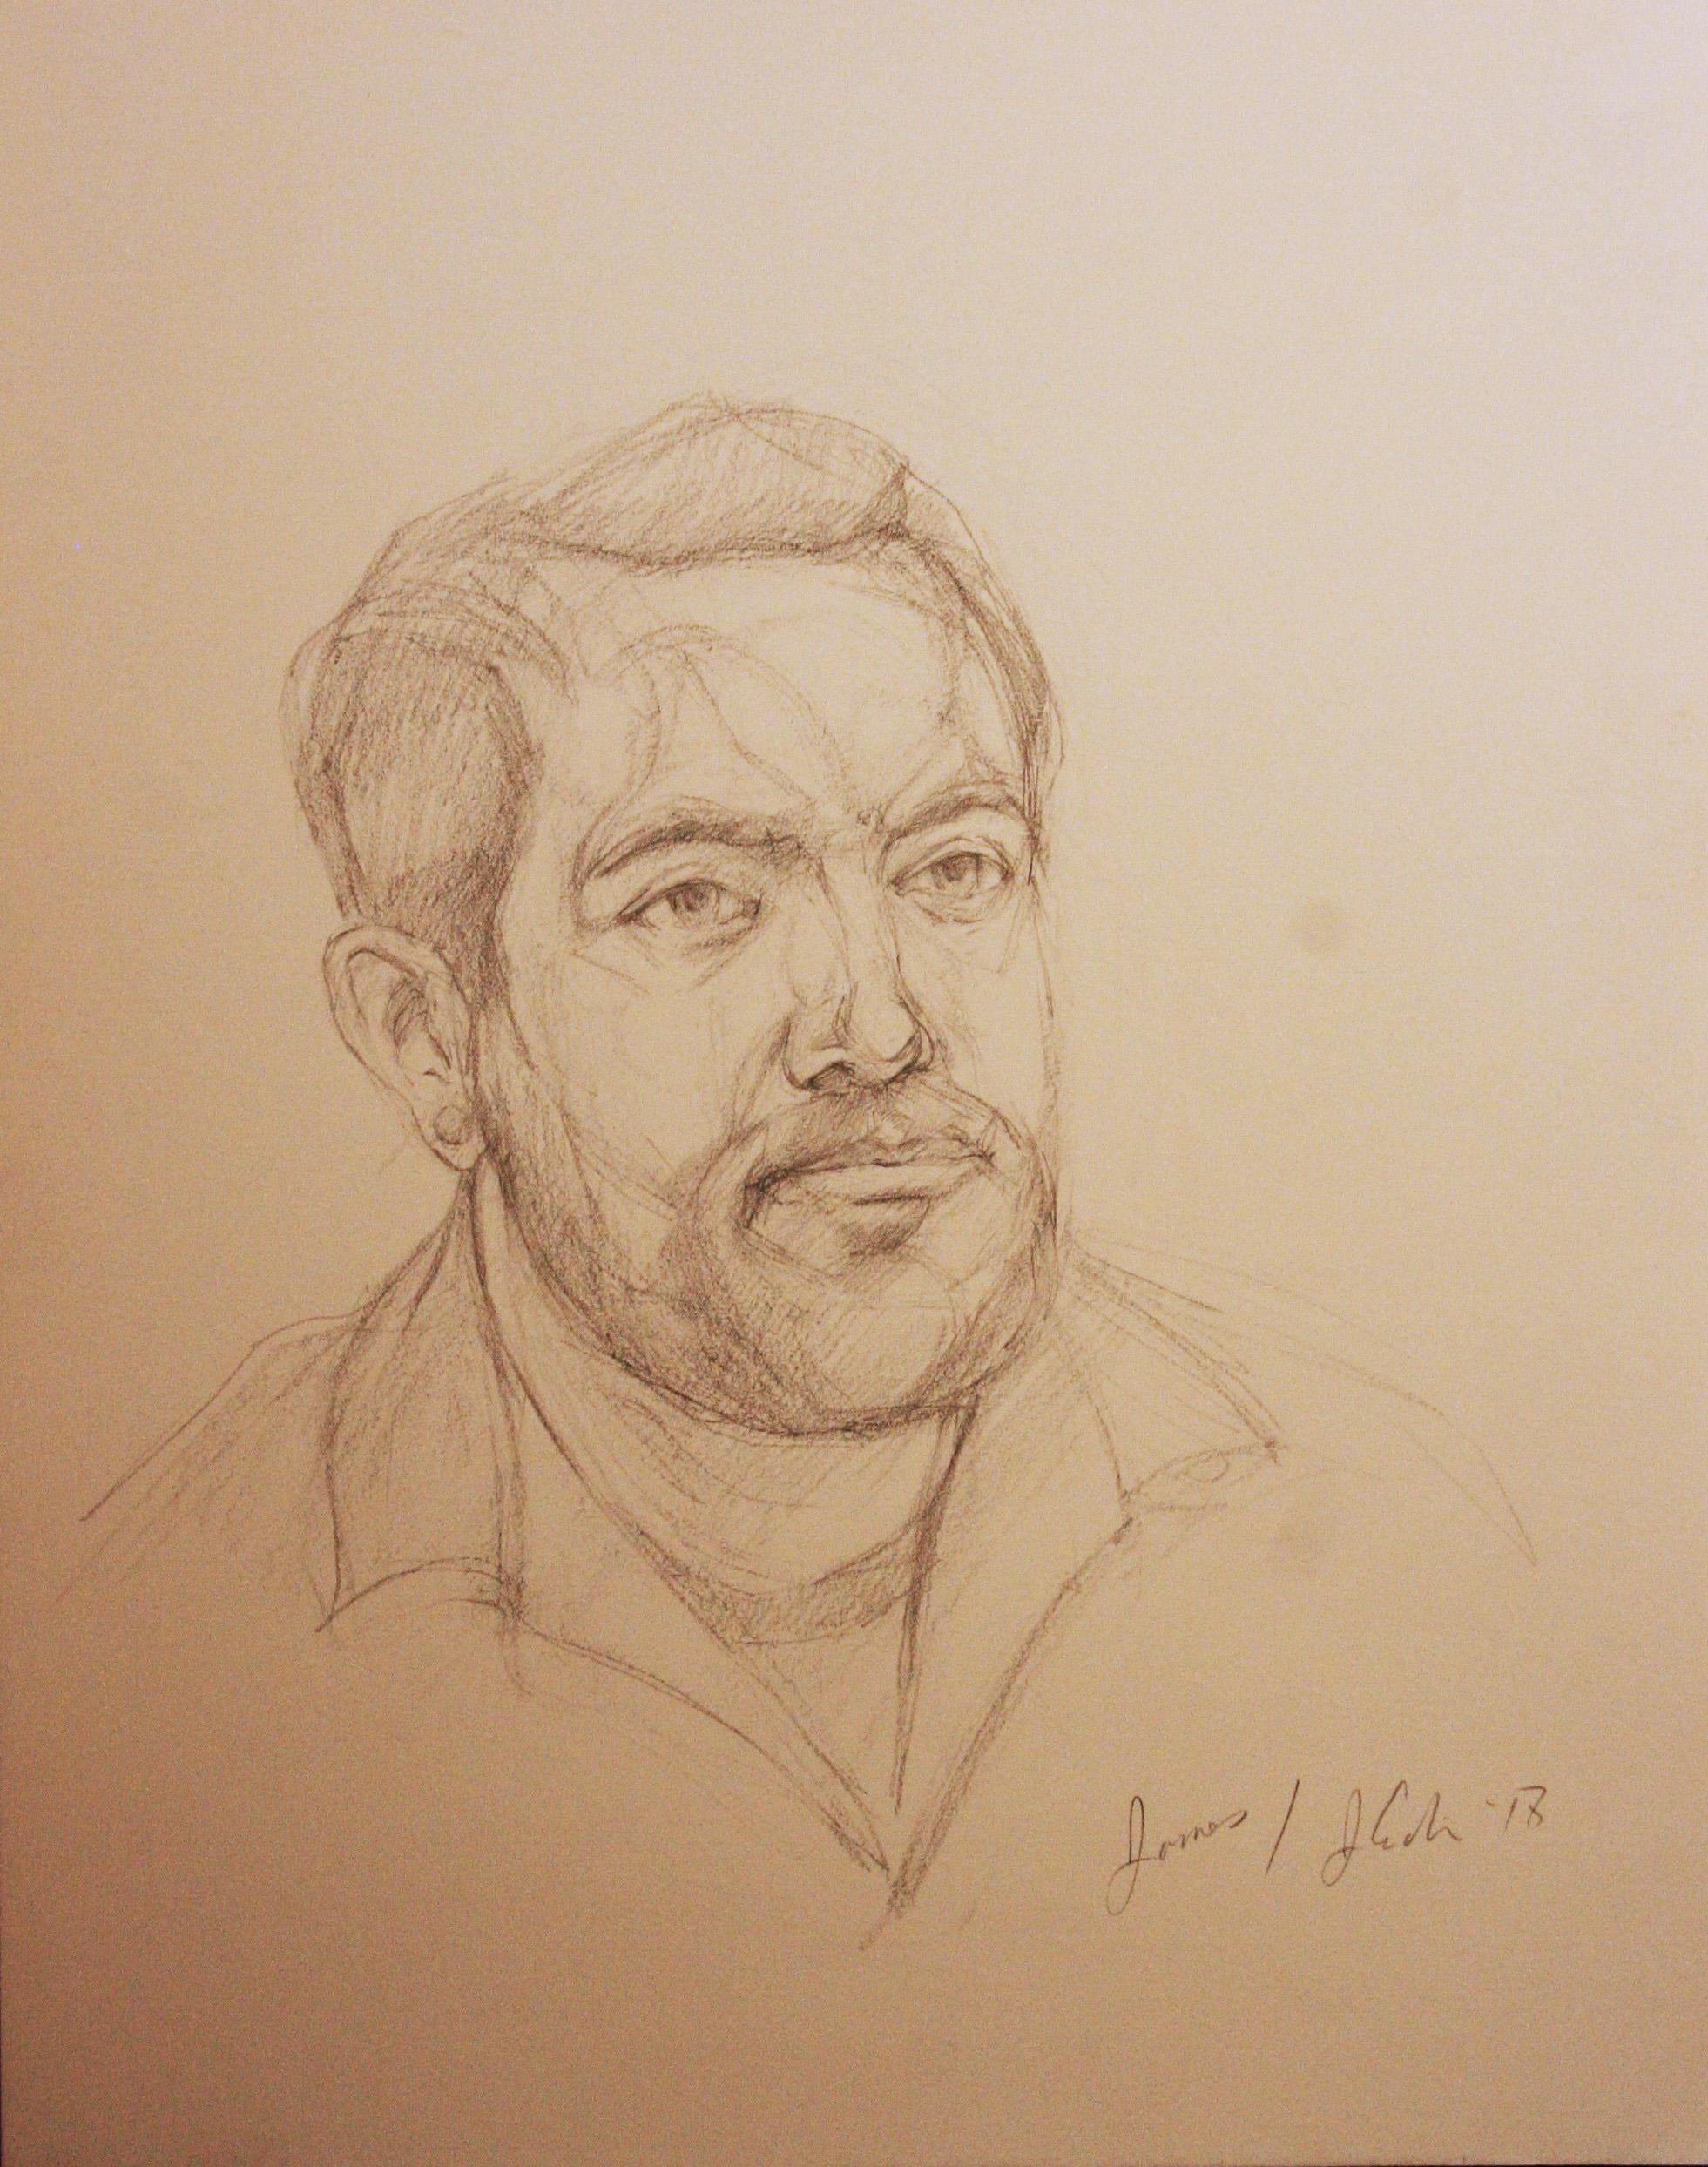 David Heller did this drawing.